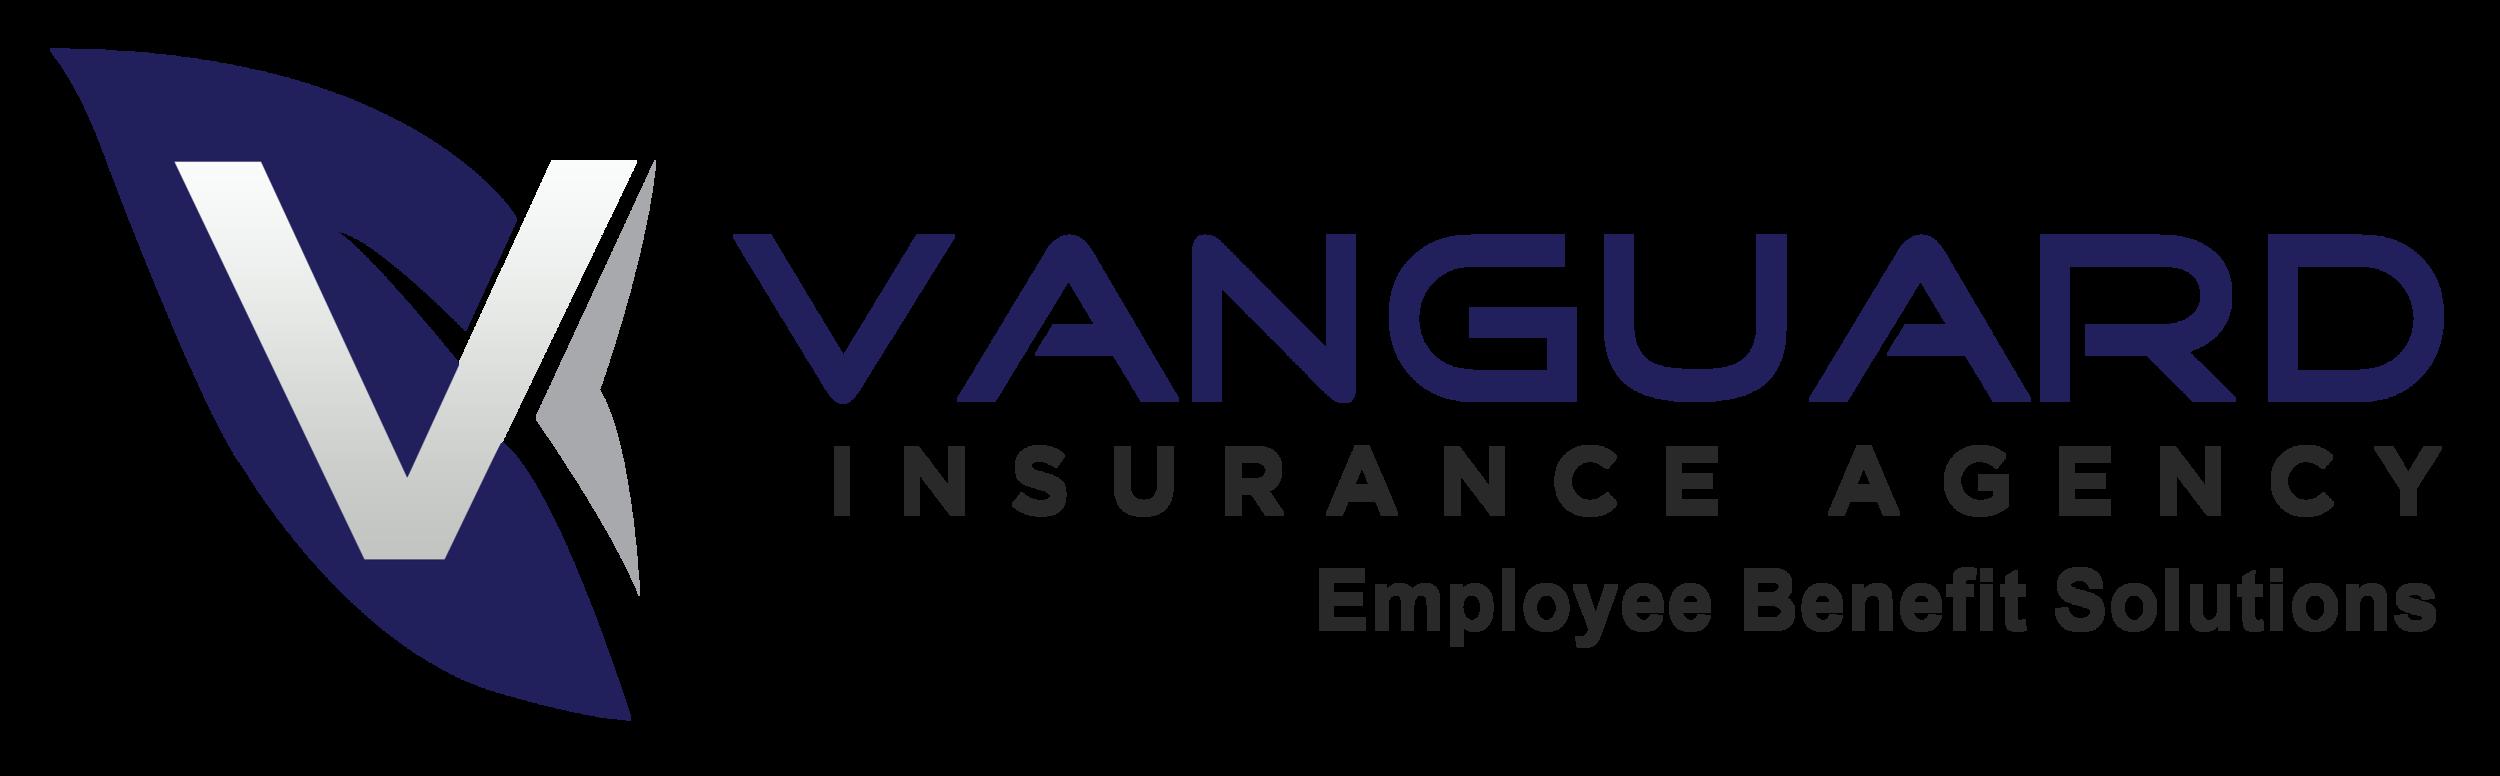 vanguard-insurance logo.png